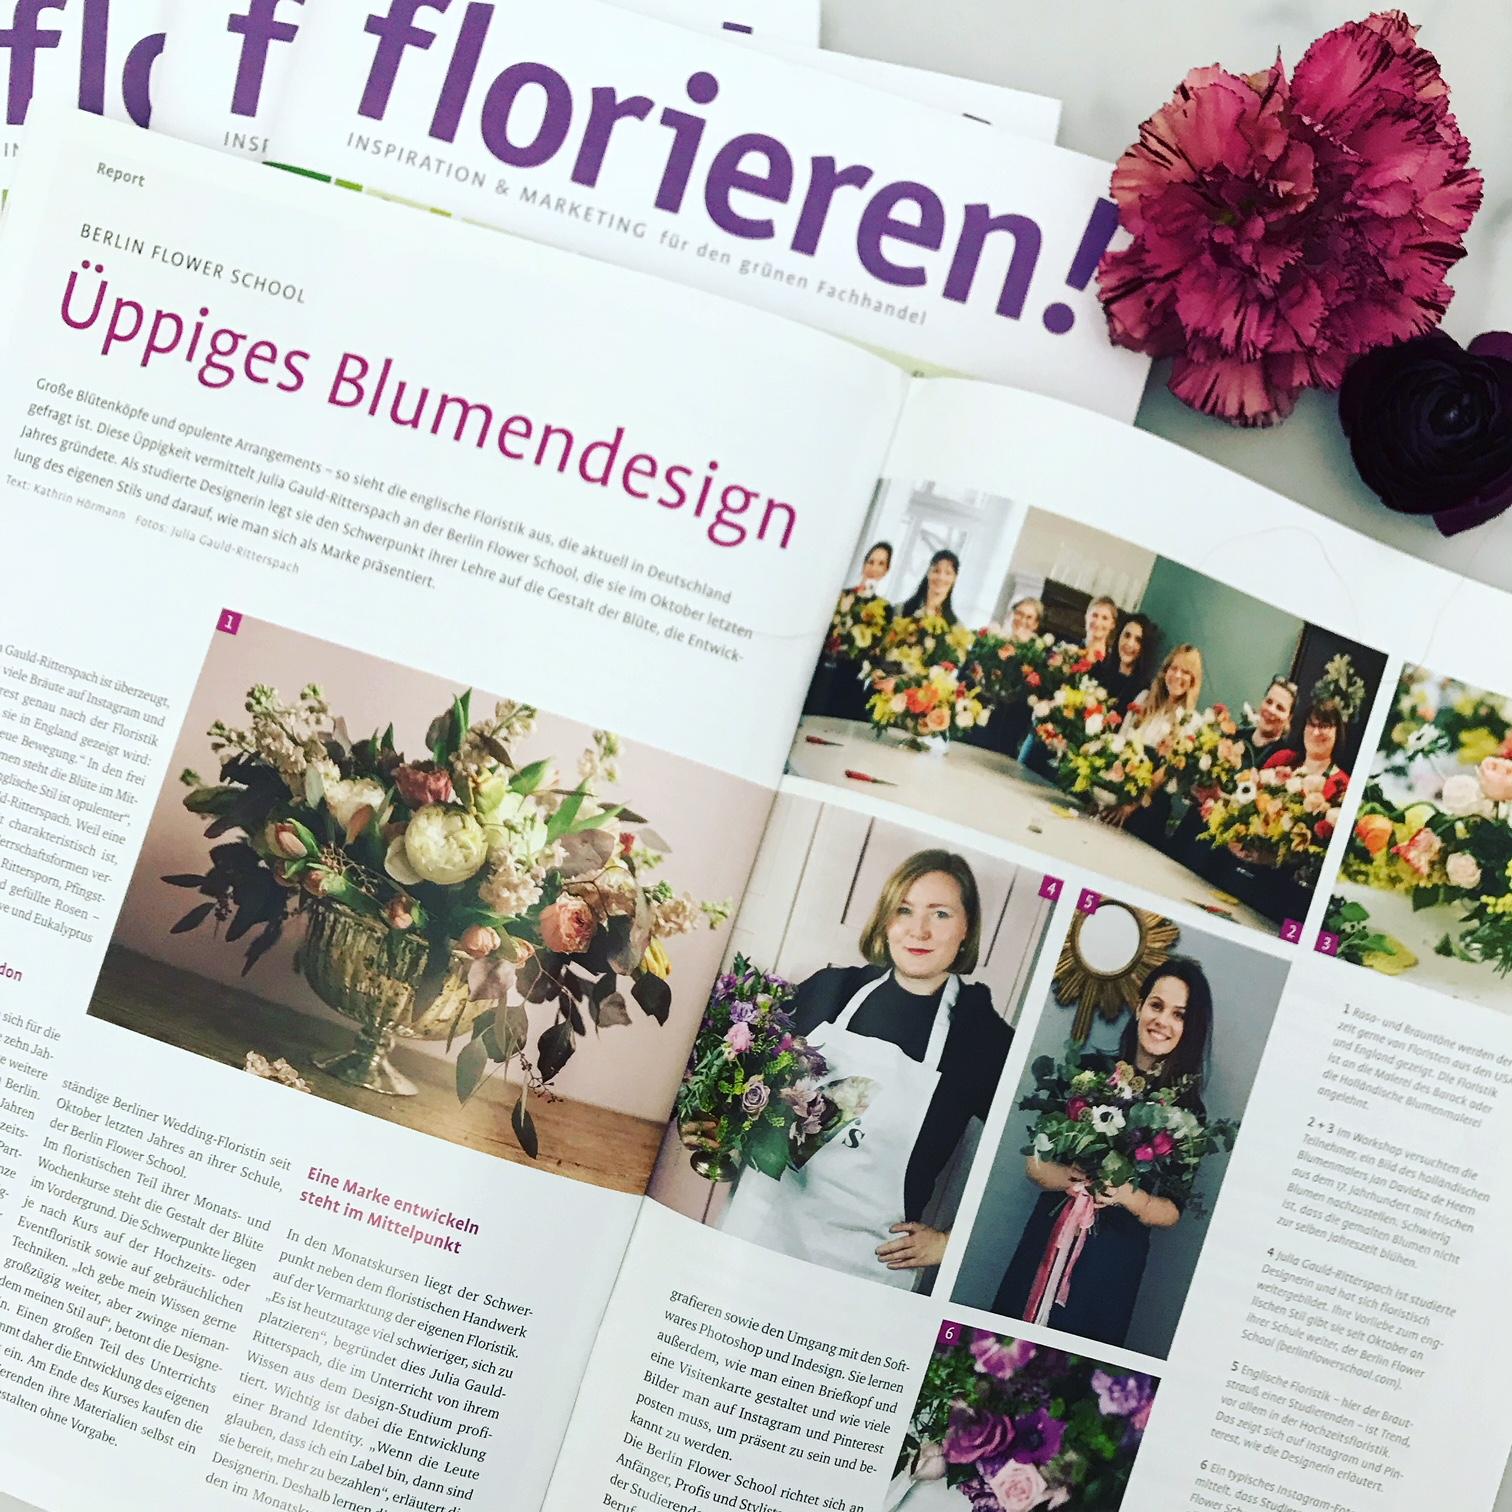 News Berlin Flower School Featured In German Magazine Florieren